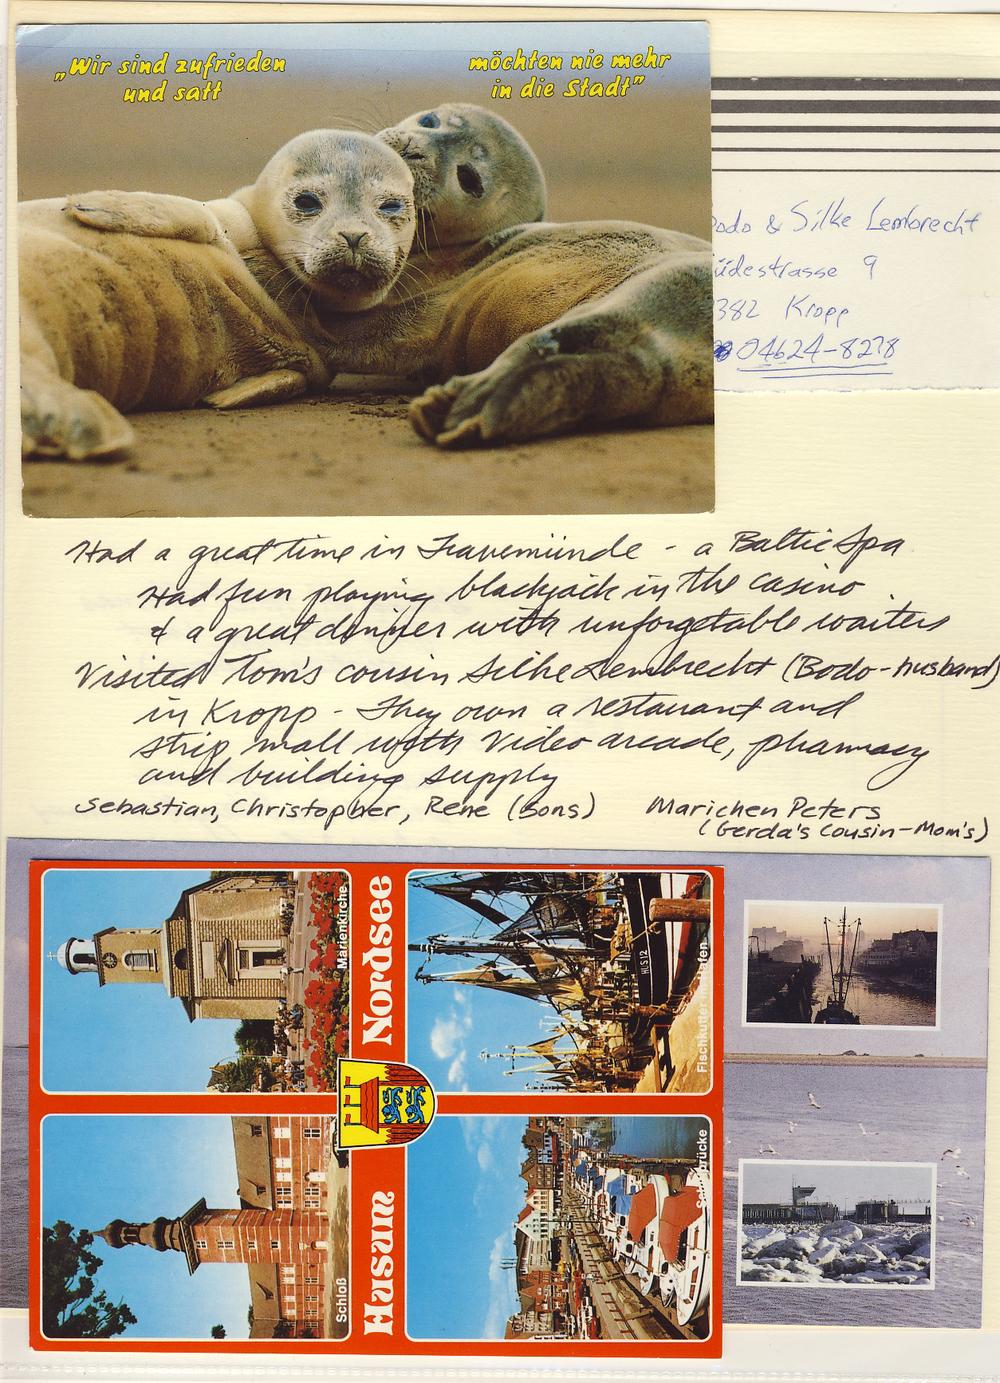 A70_Europe_1991_190.jpg